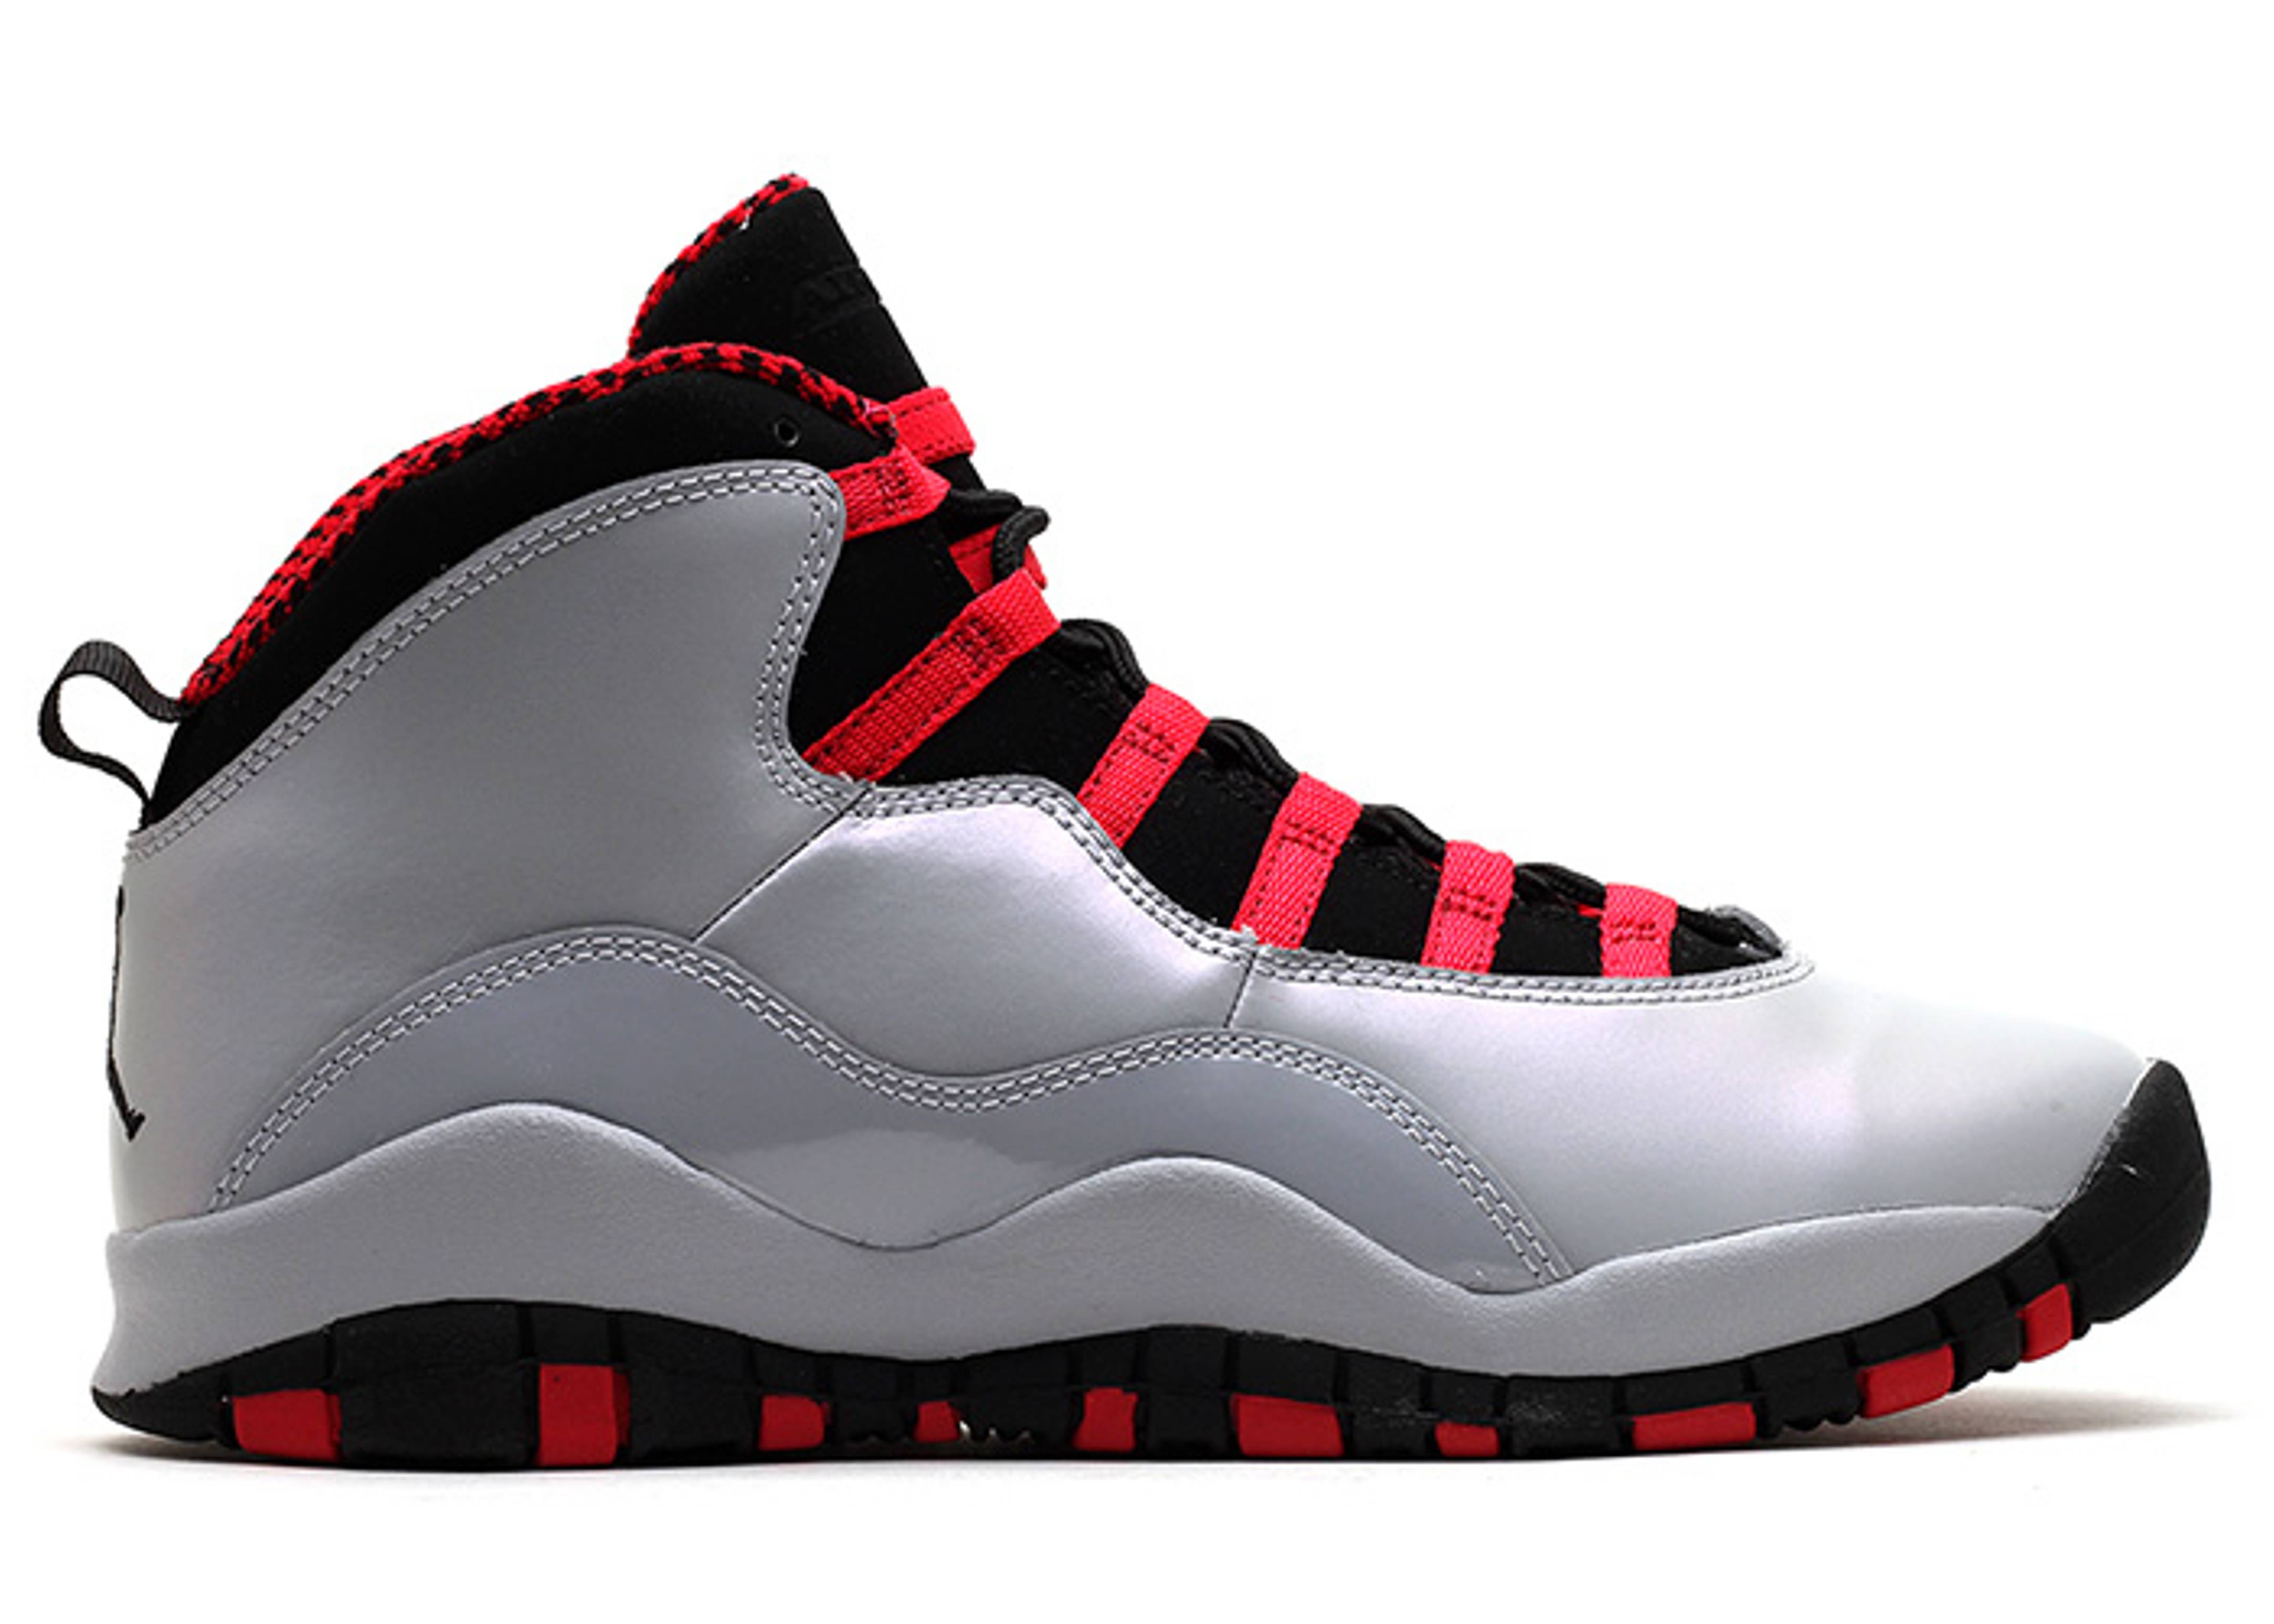 Girls Air Jordan 10 Retro (GS) - 487211-009 - Size 7 - ps3IysU9